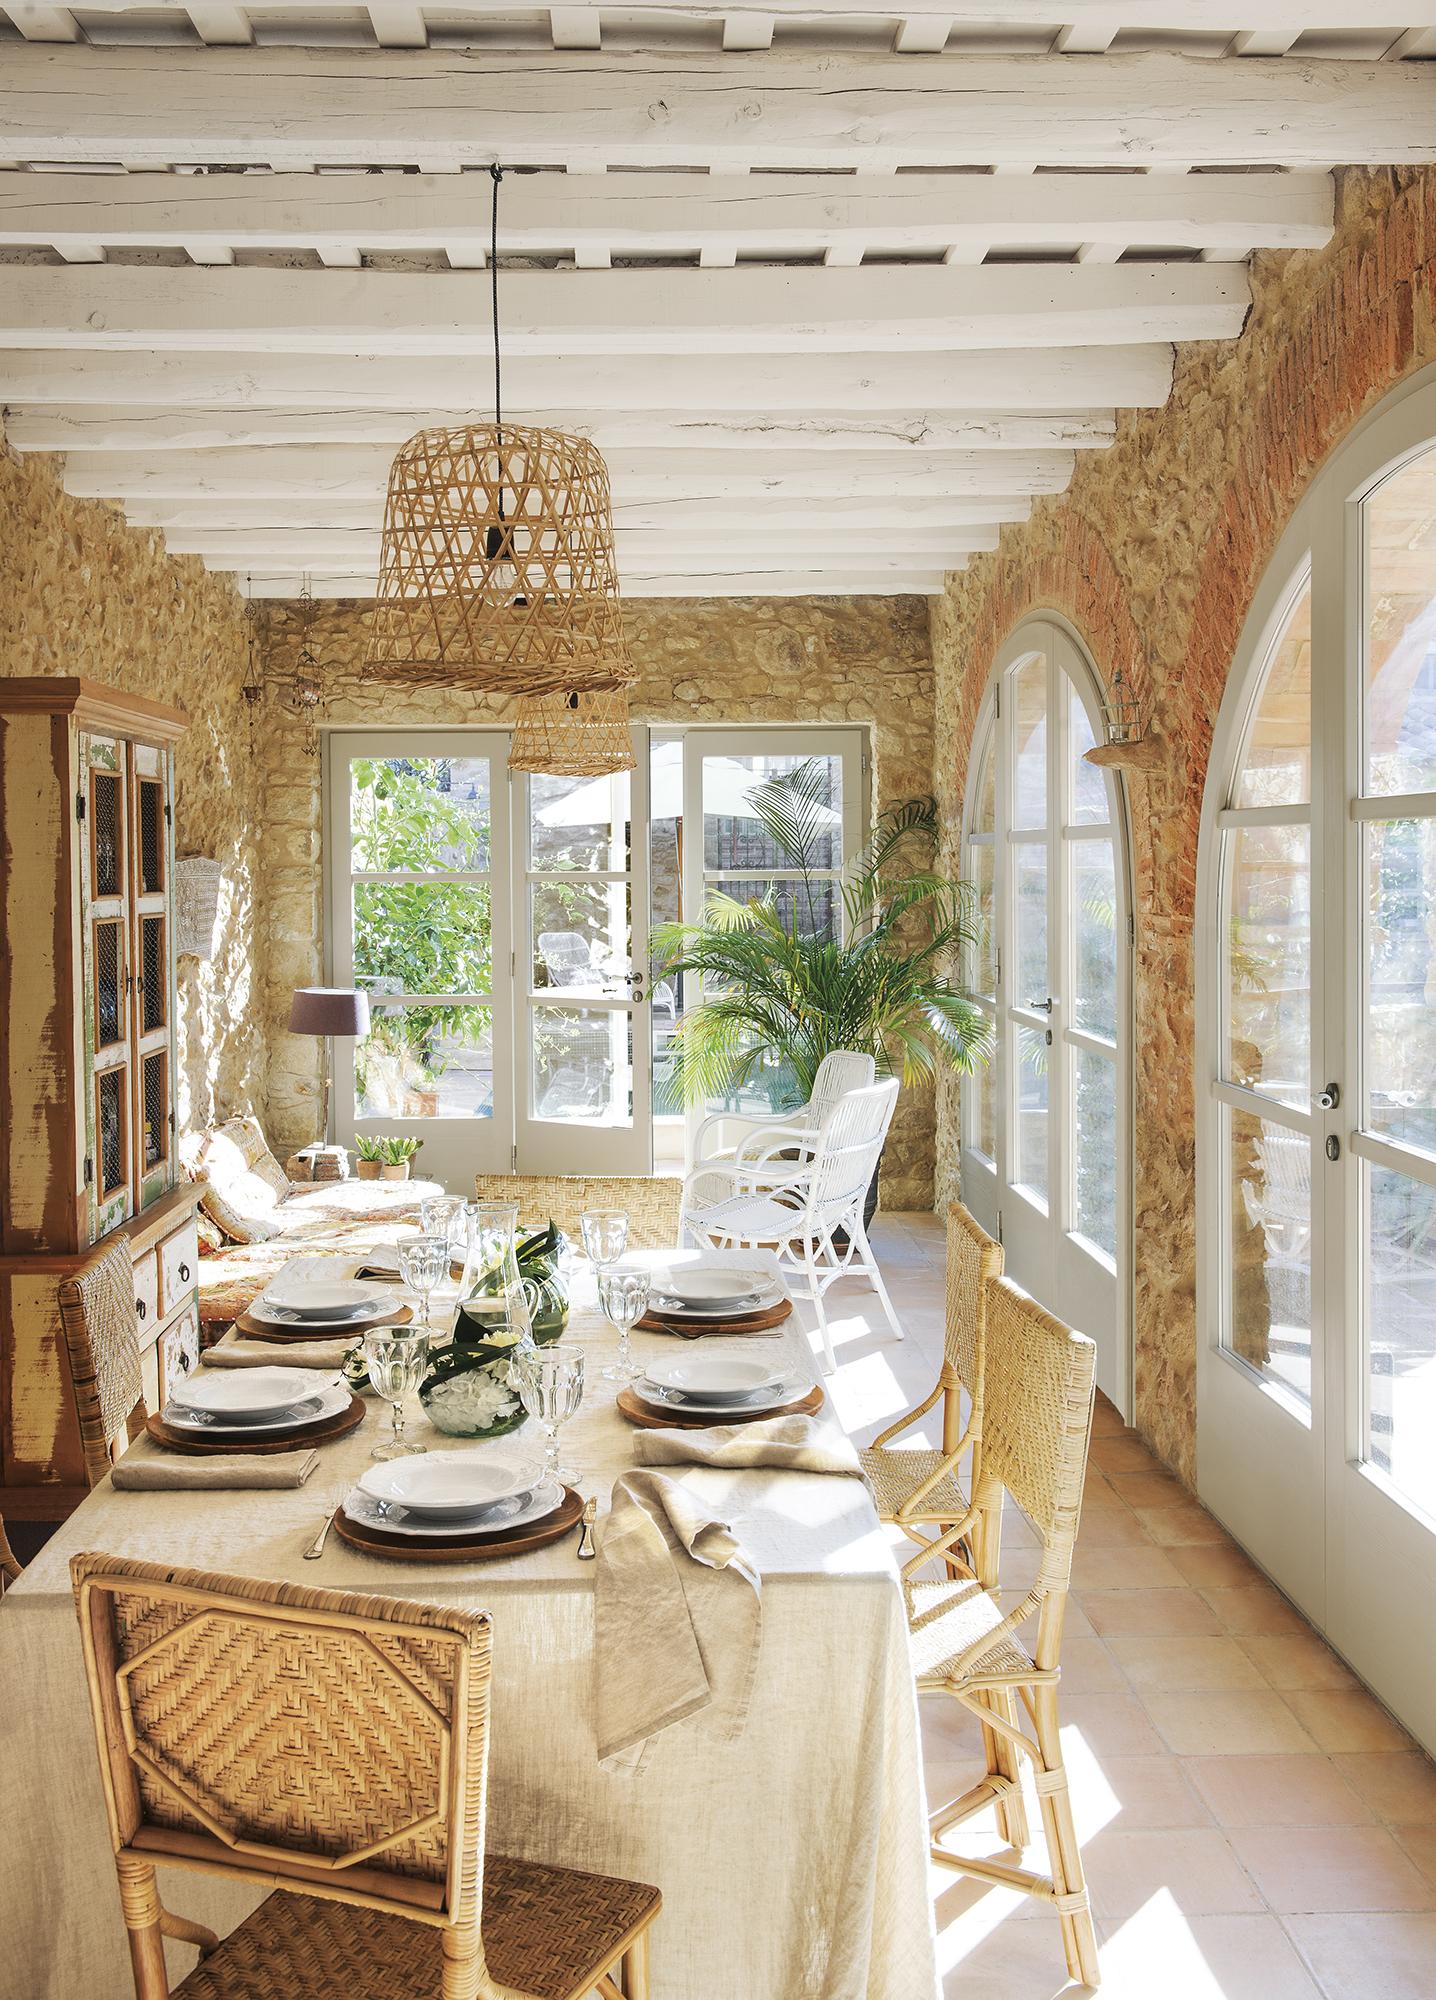 Maison en pierre en Espagne